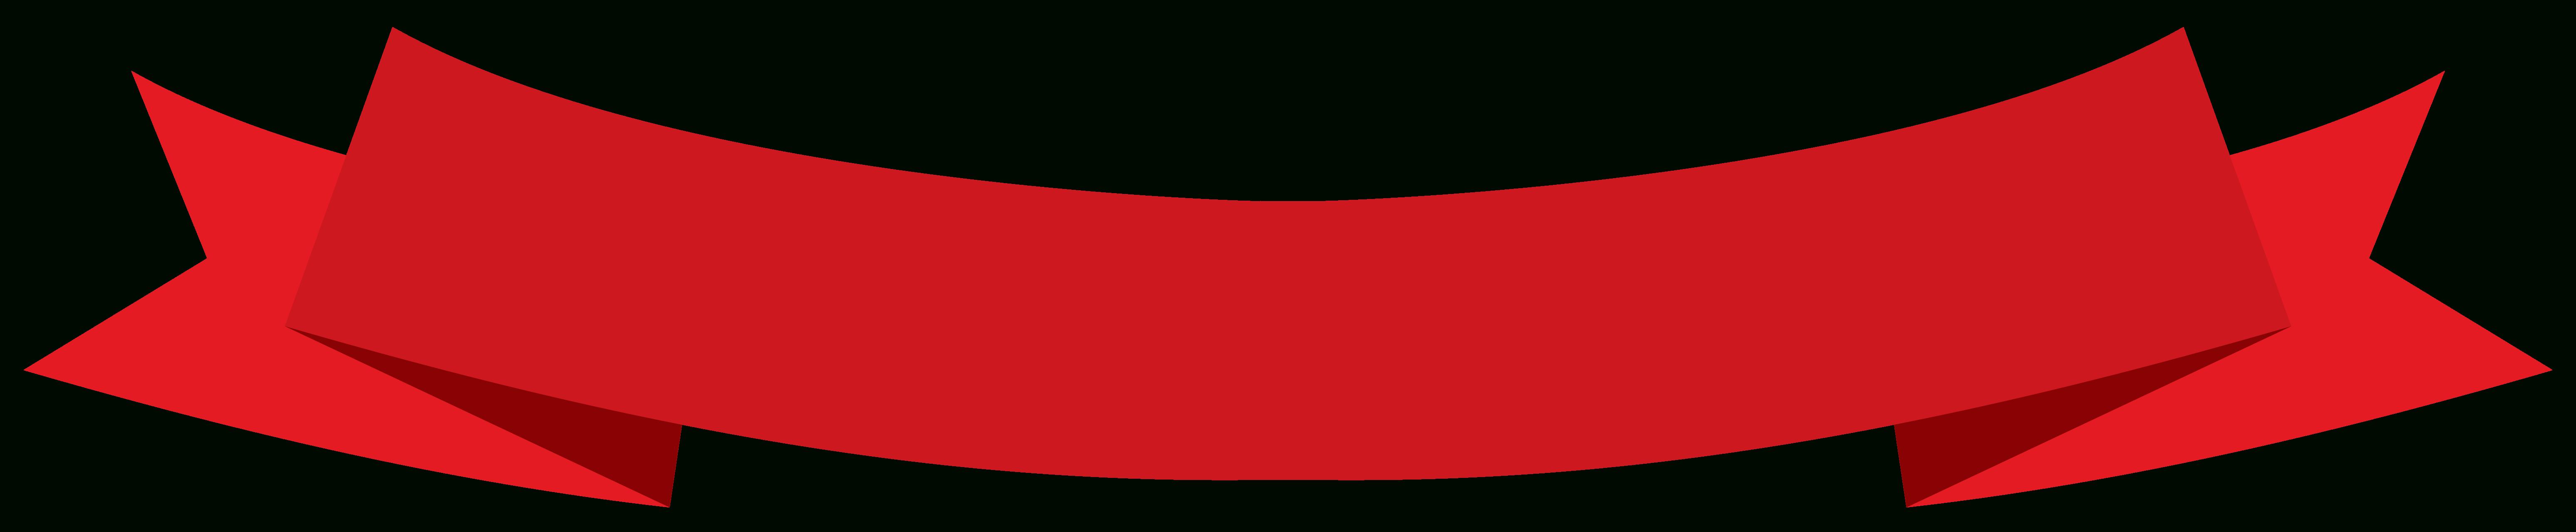 Banner clip art ribbon. Red clipart sunglassesray ban